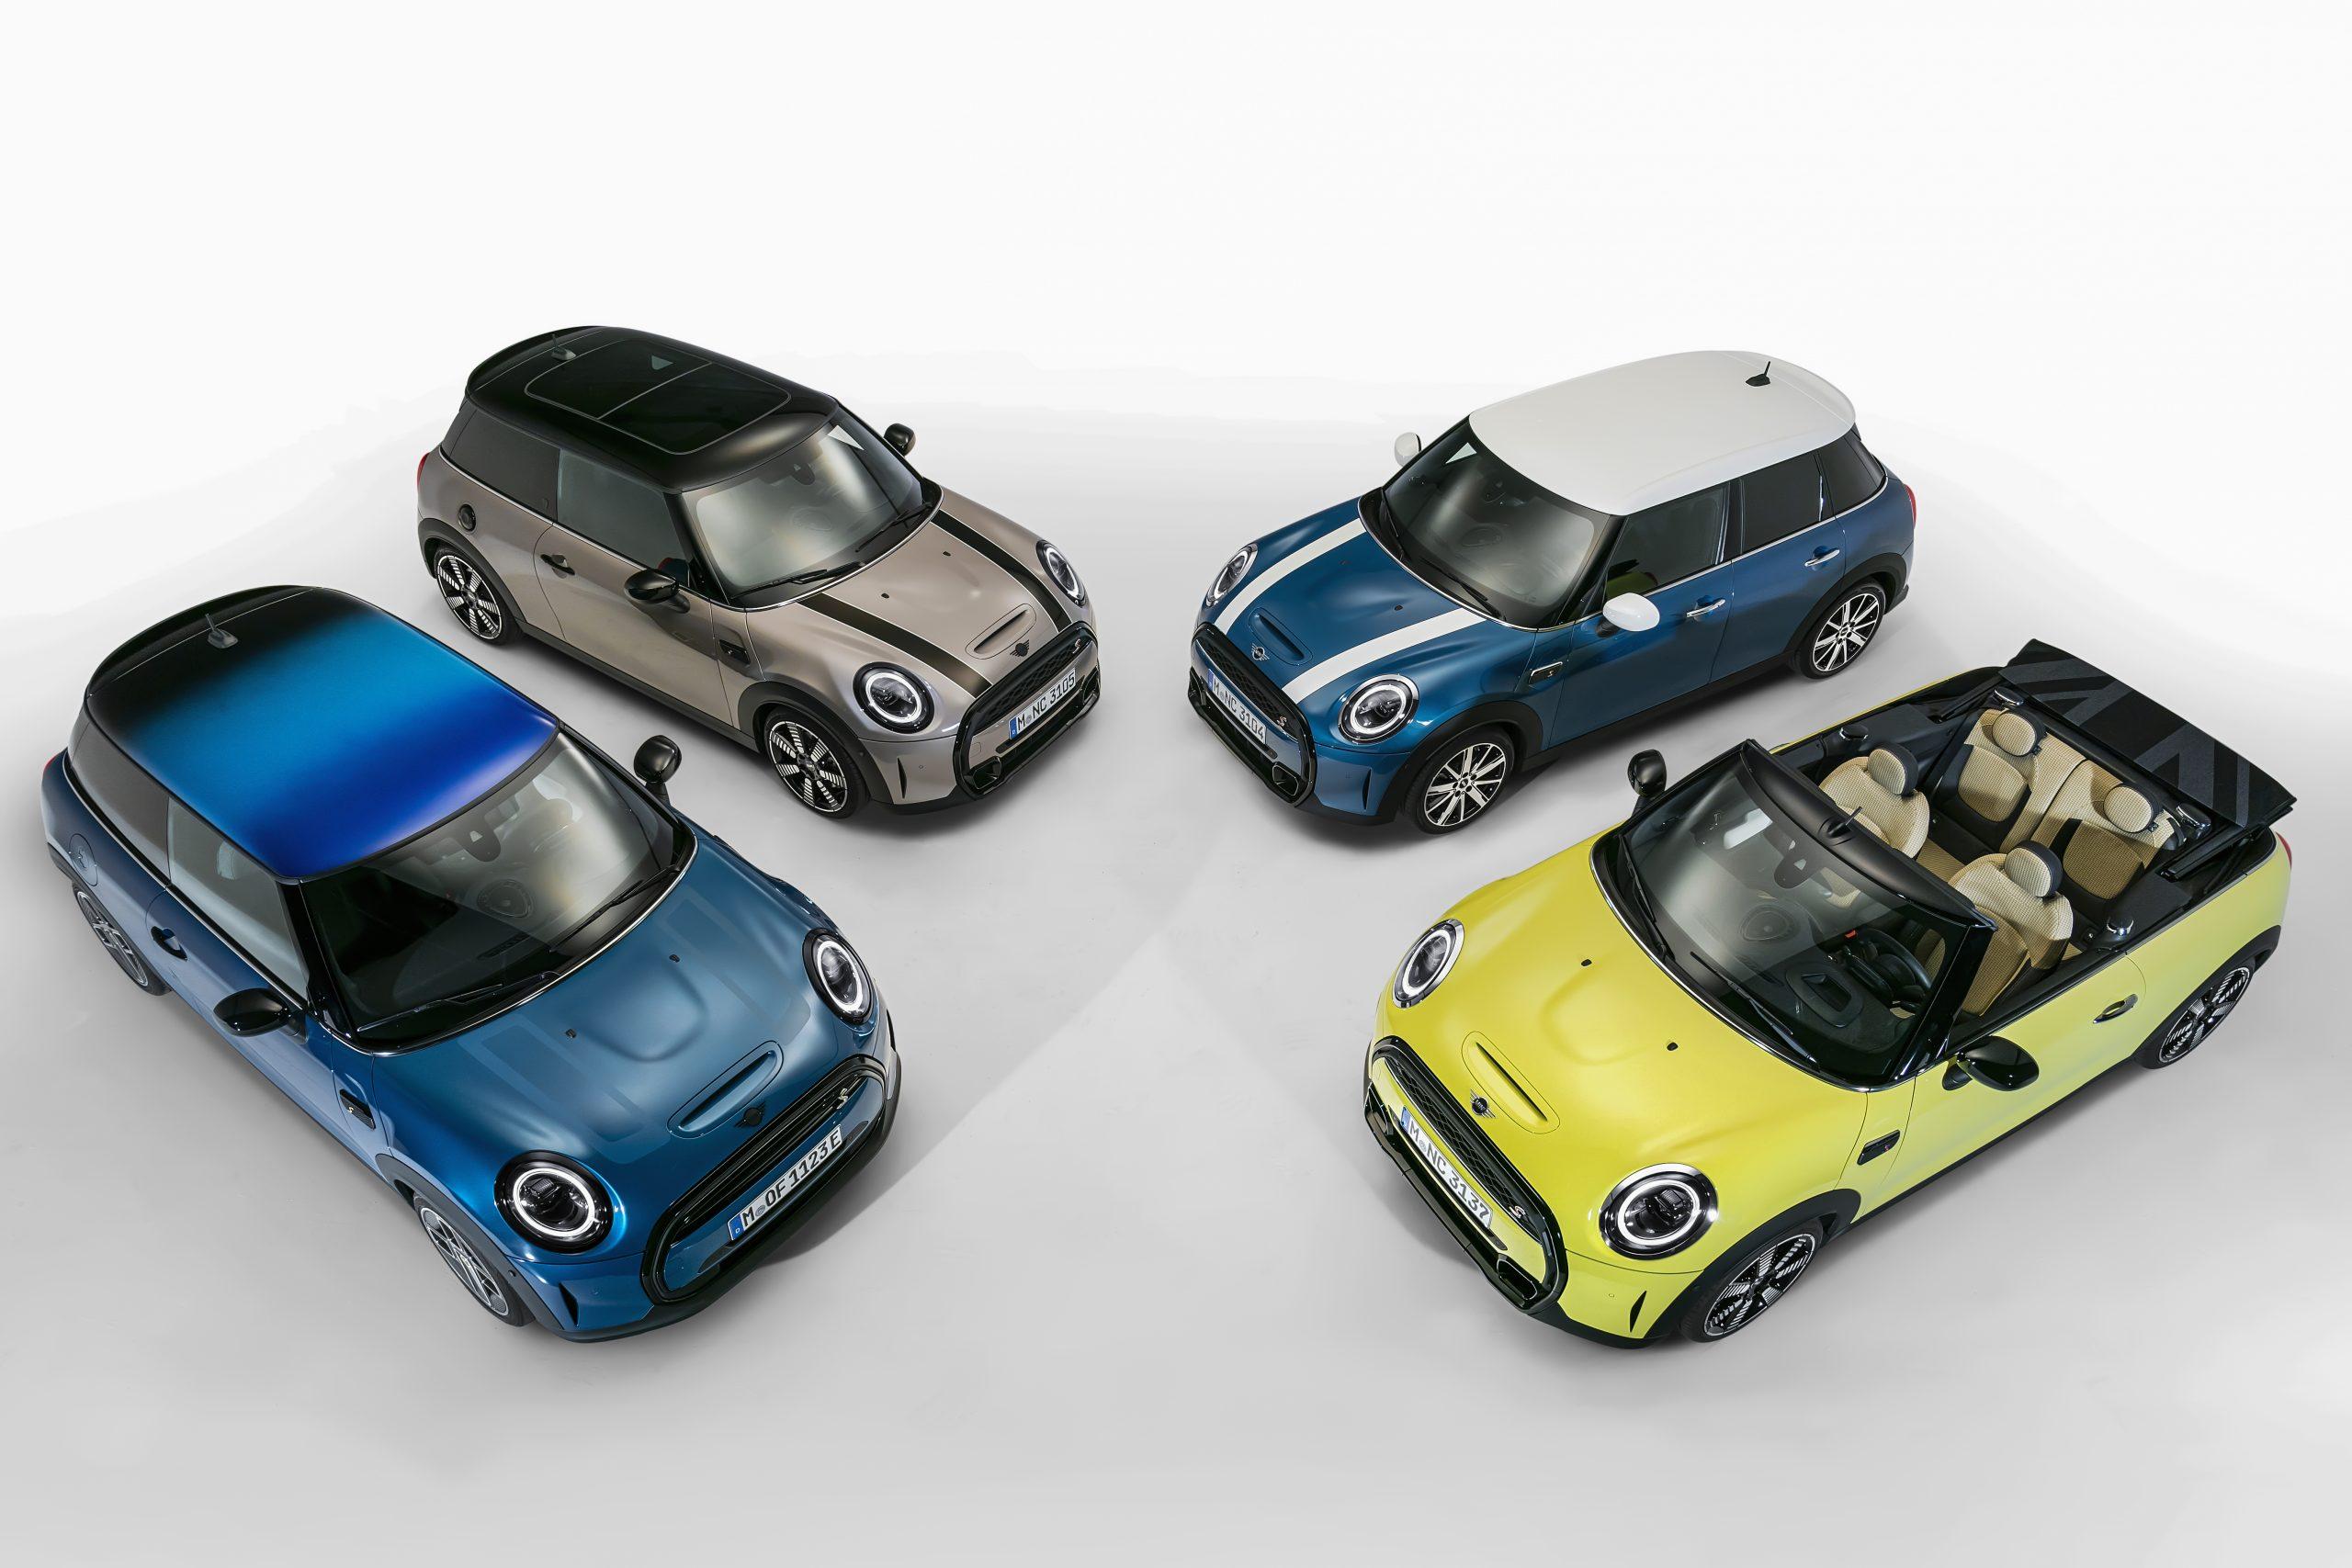 De vernieuwde MINI 3-deurs, de MINI 5-deurs en de MINI Cabrio.